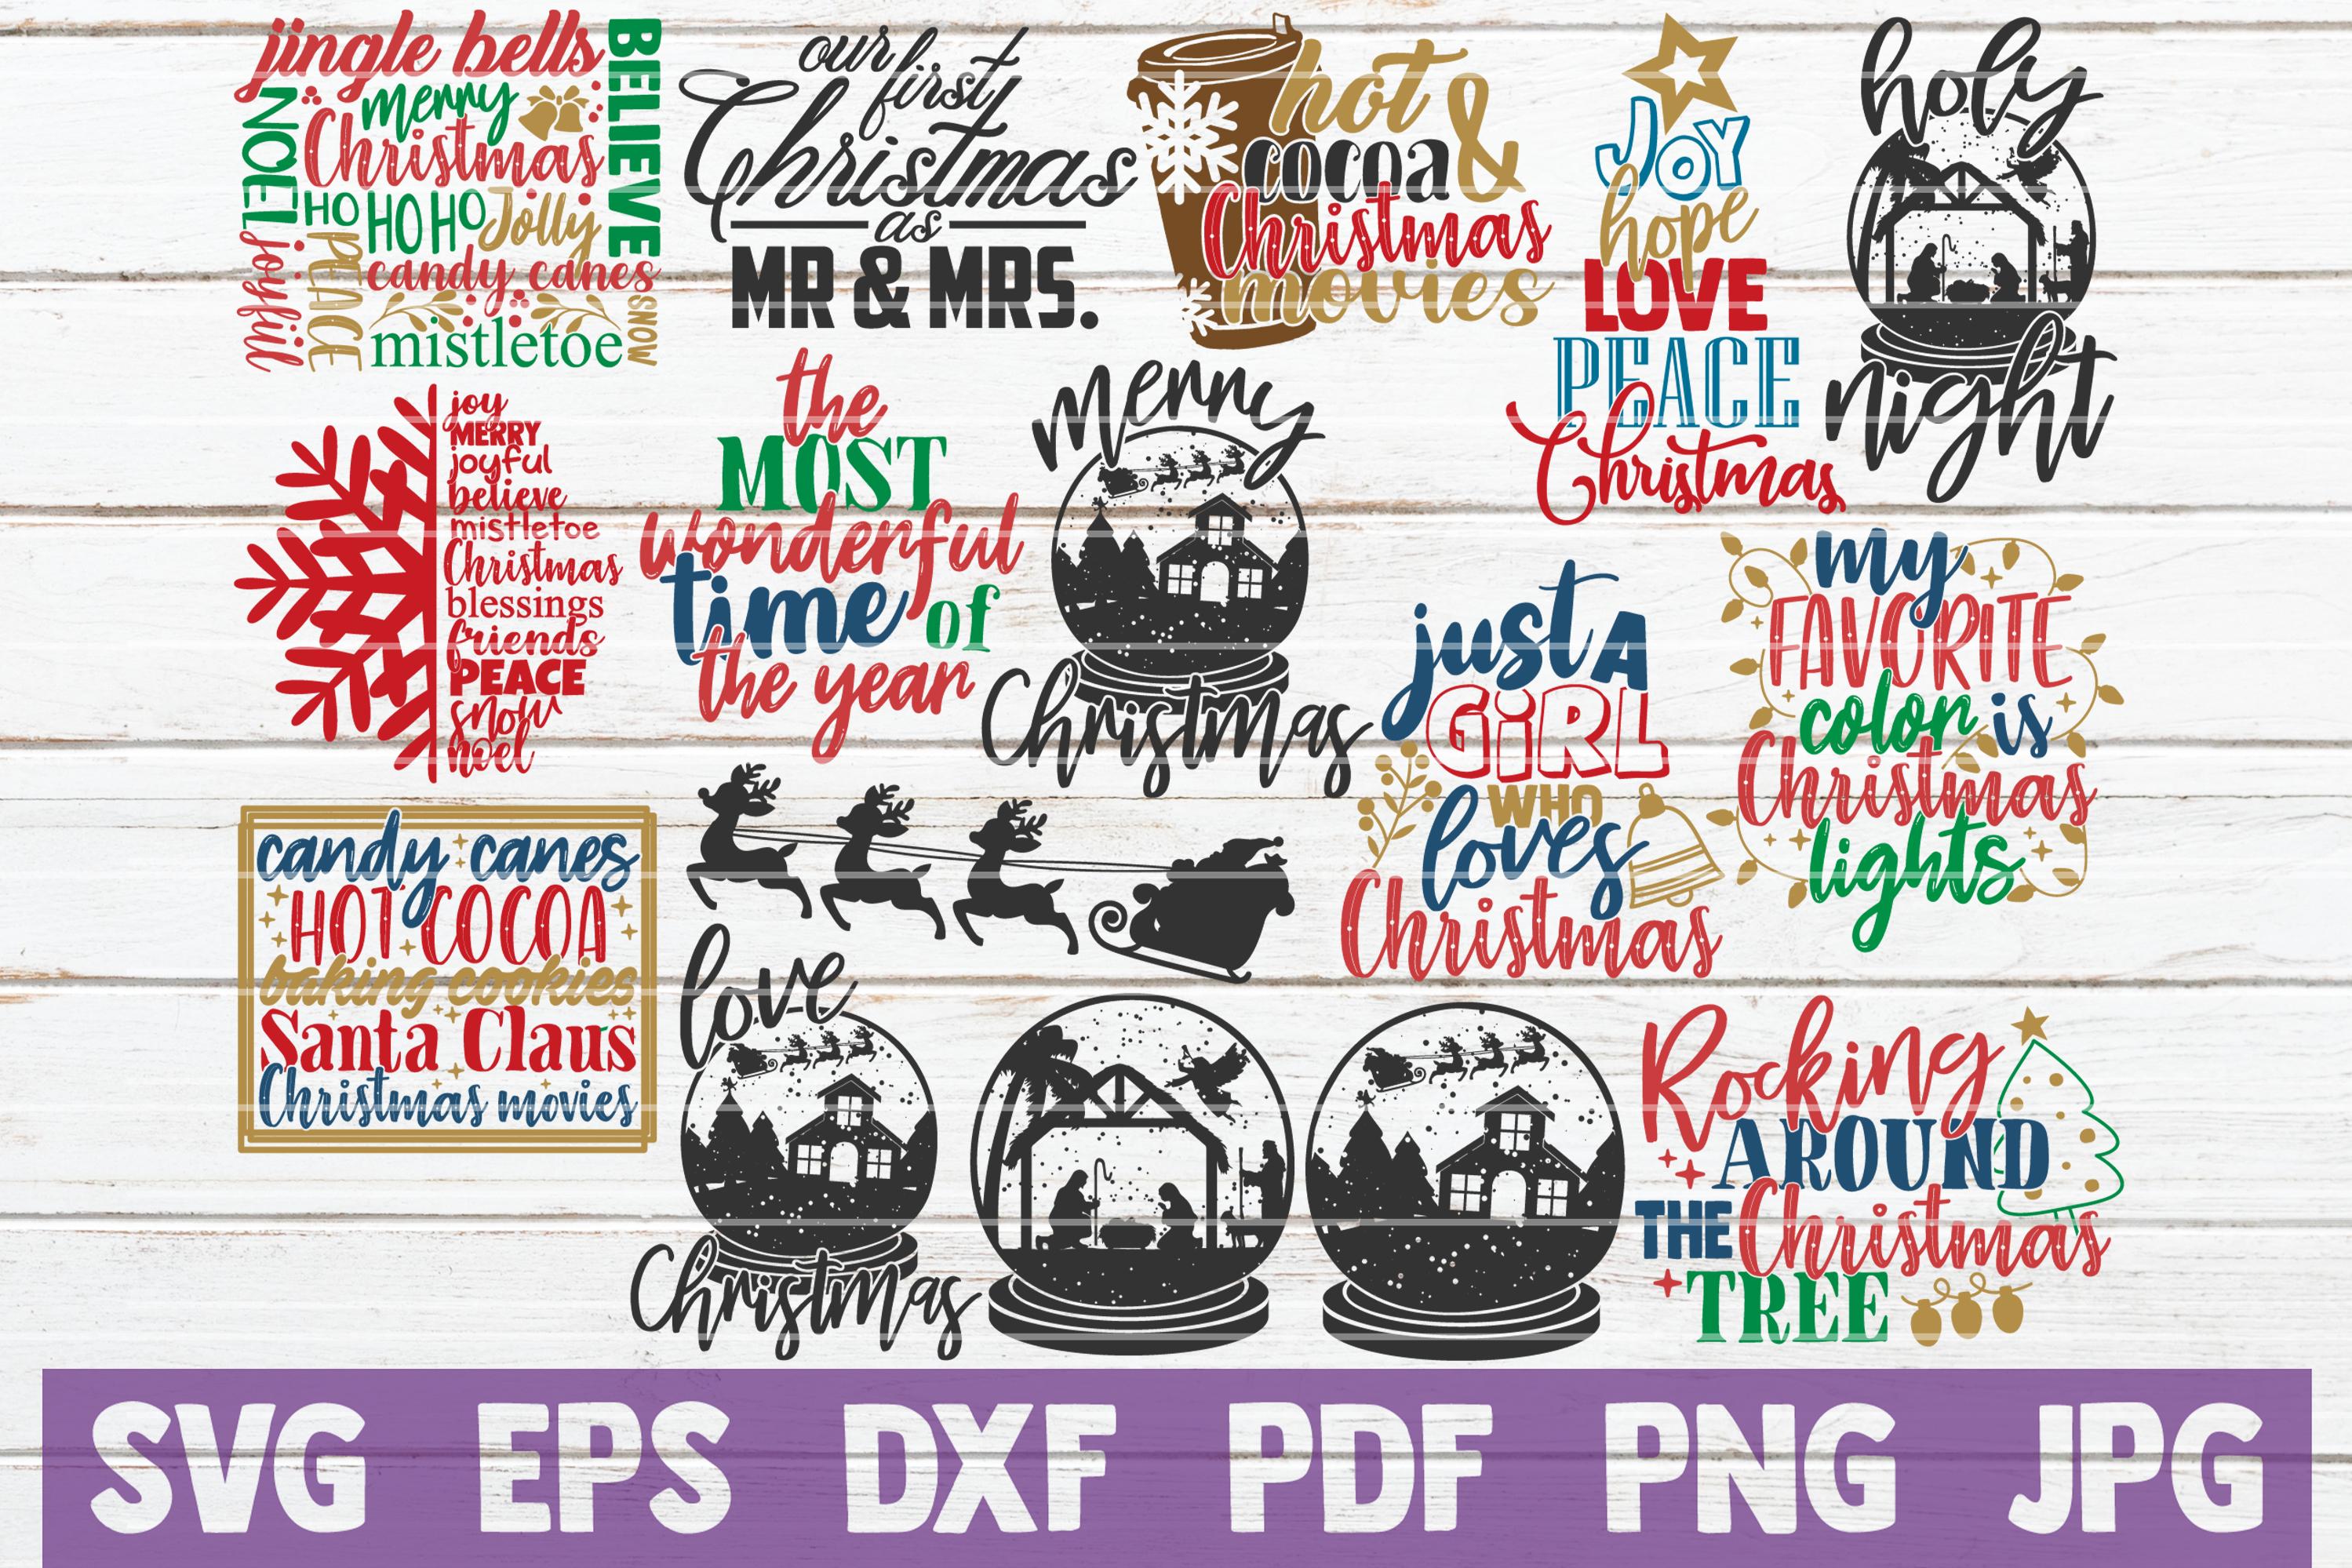 HUGE Christmas SVG Bundle |100 Holiday Designs SVG Cut Files example image 2